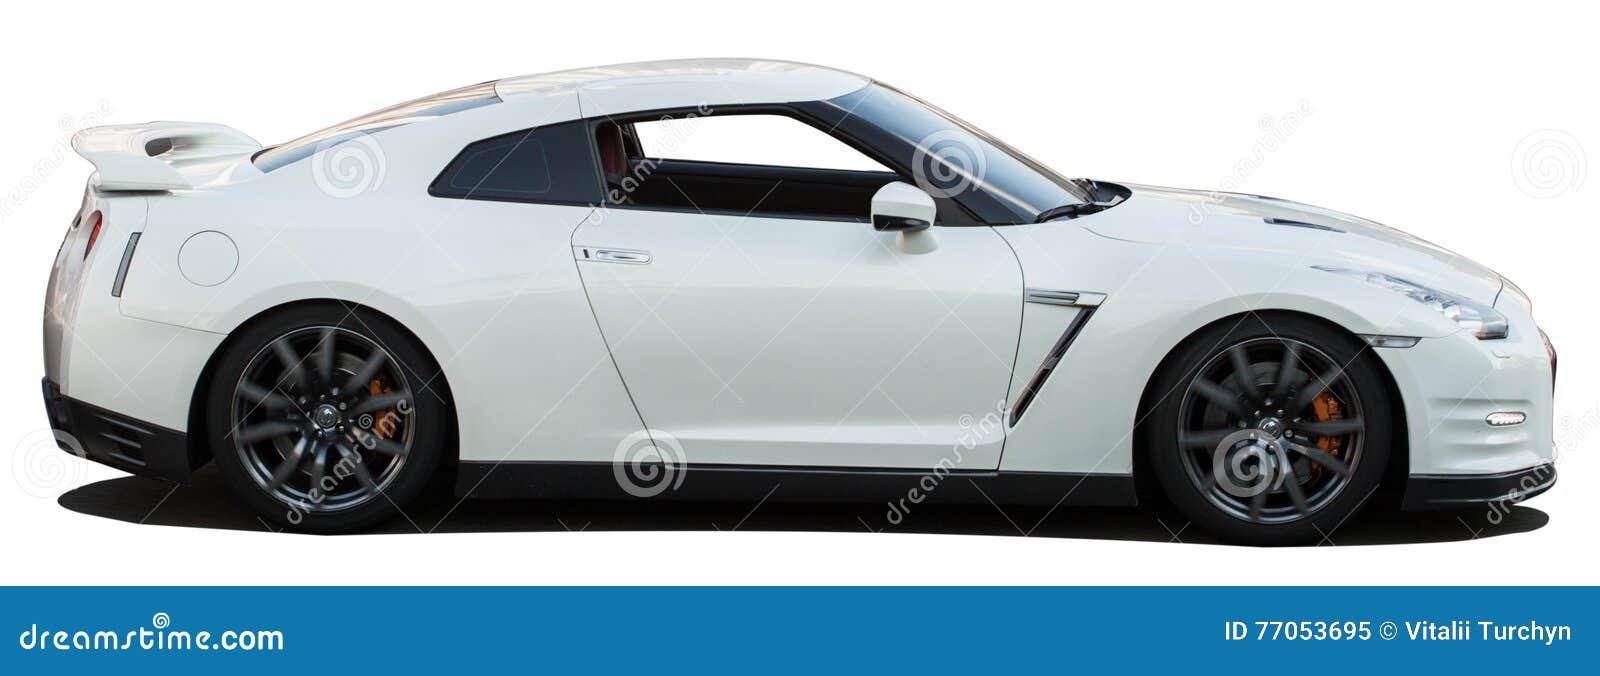 Gtr No Background >> White Nissan Skyline Gtr On A Transparent Background Stock Photo